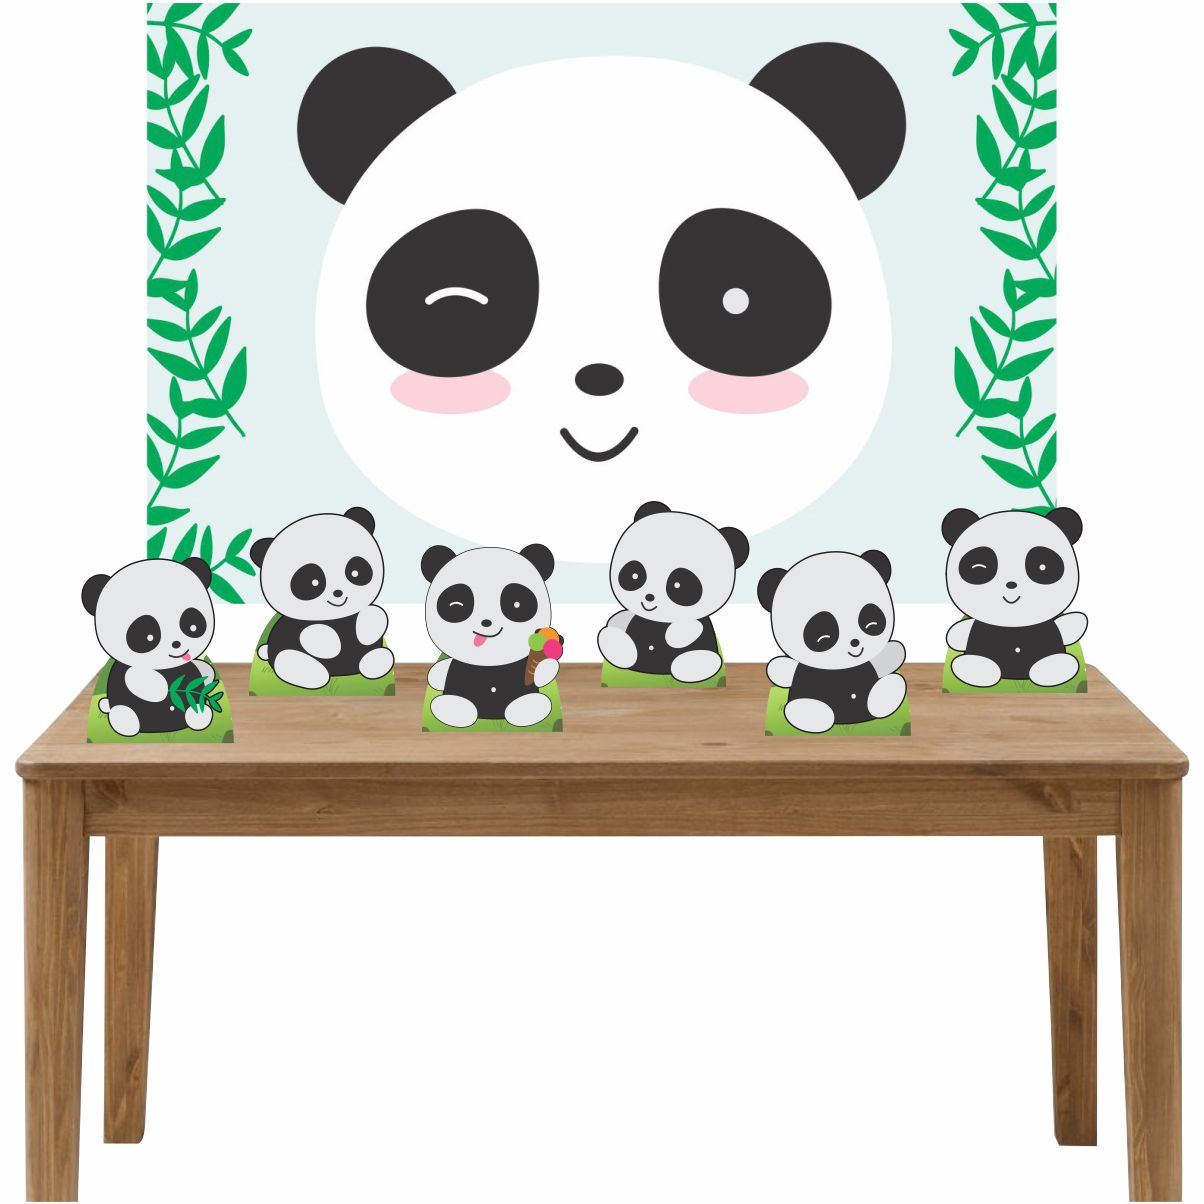 Kit 6 Displays de Mesa e Painel Pandas